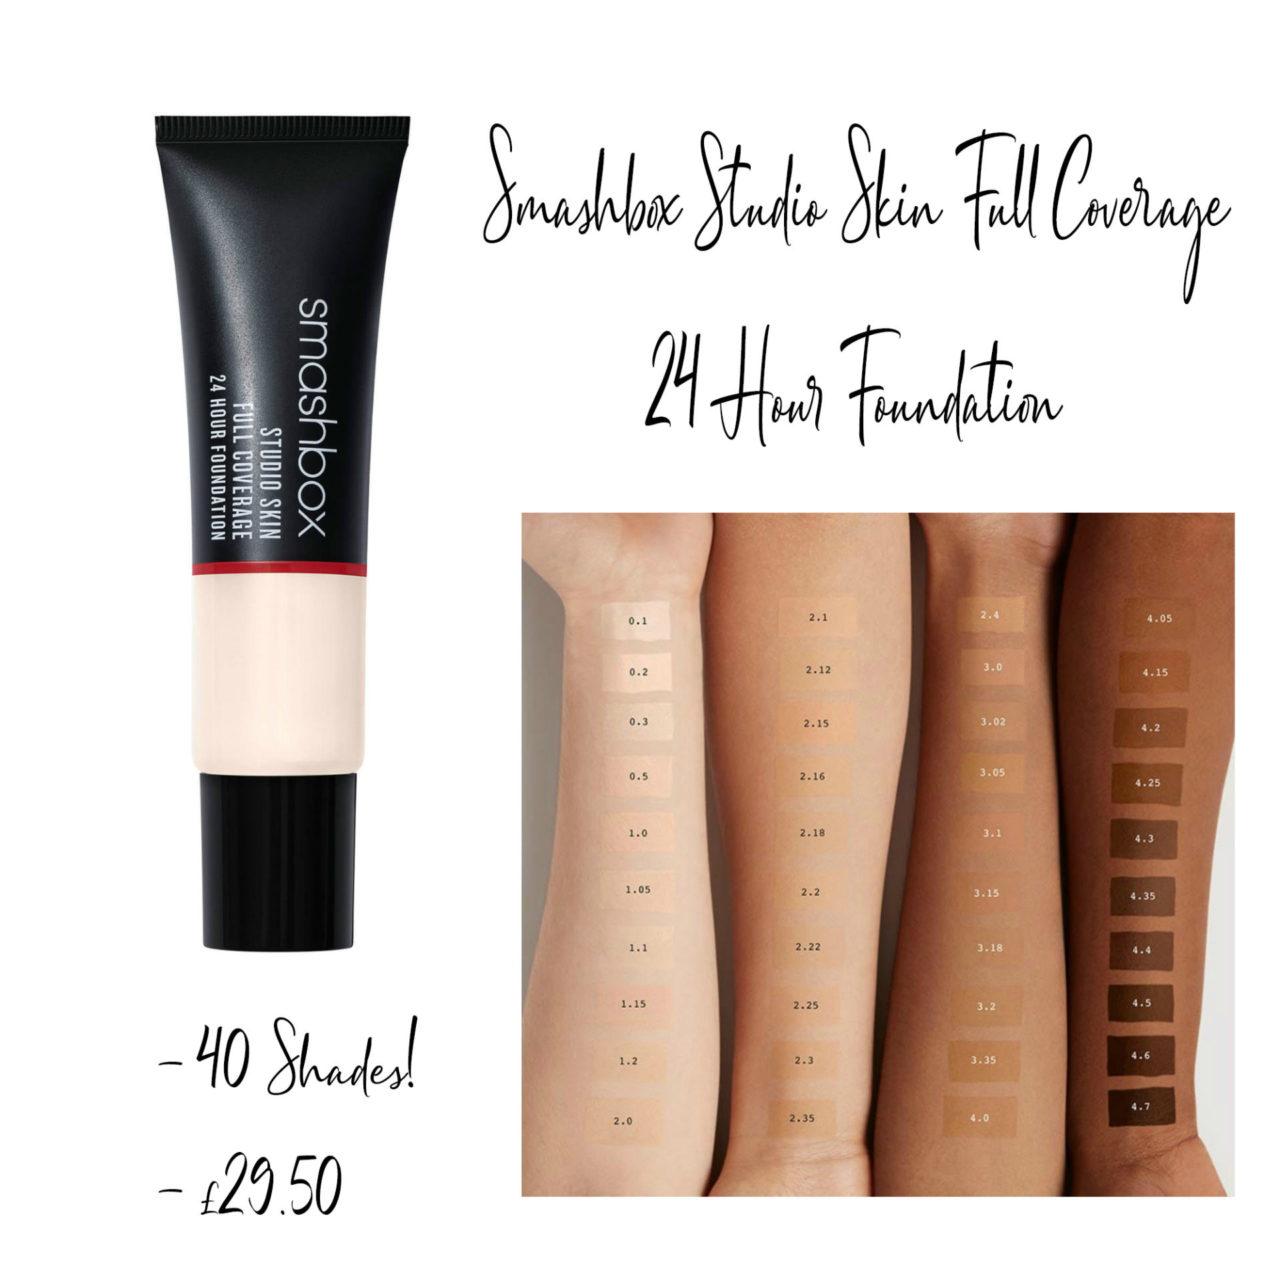 Smashbox Studio Skin Full Coverage 24 Hour Foundation